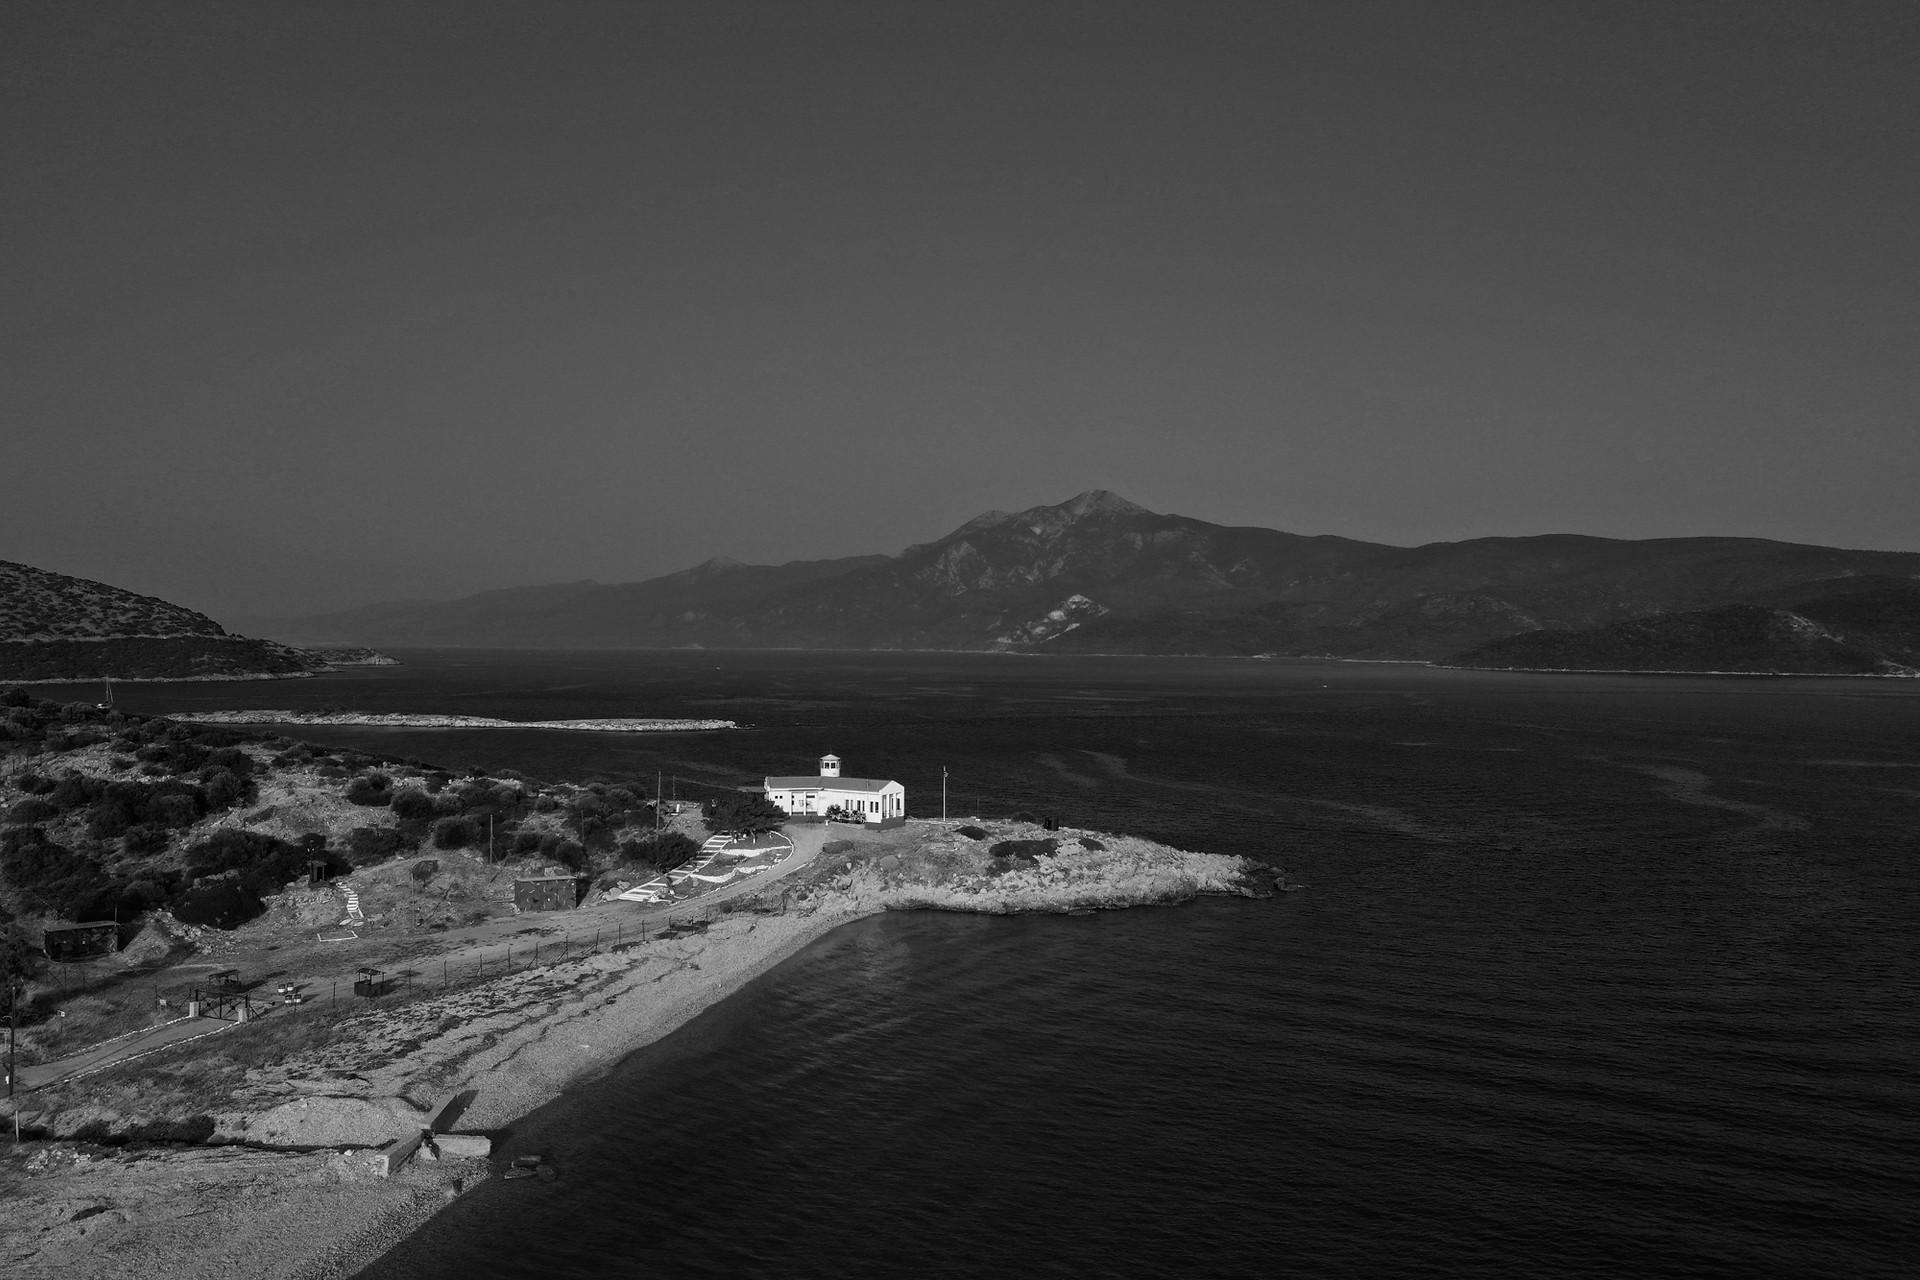 The Greece-Turkey sea border